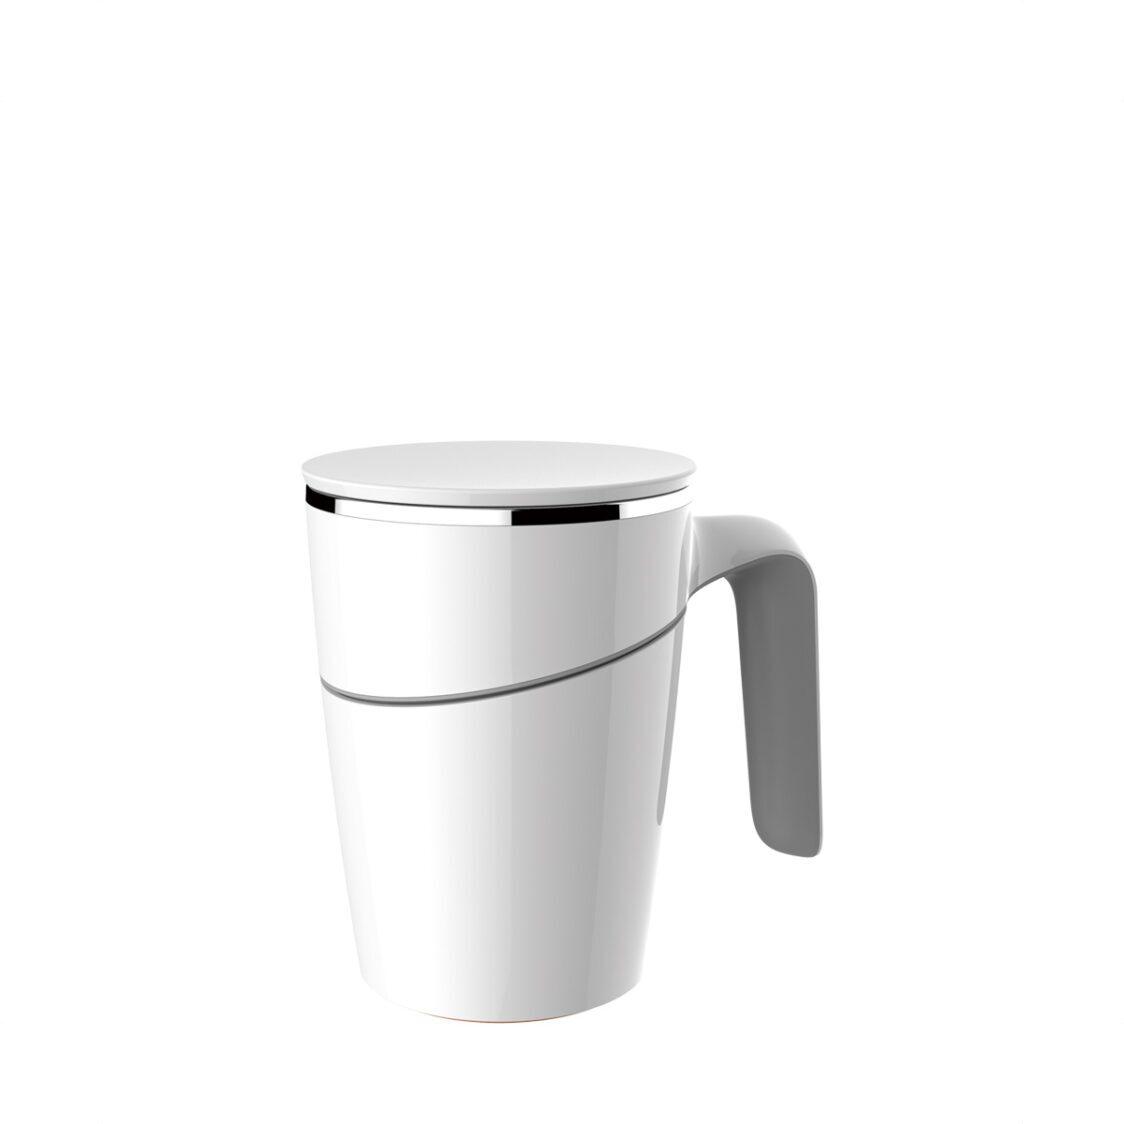 Artiart Suction Mug Grace White 470ml